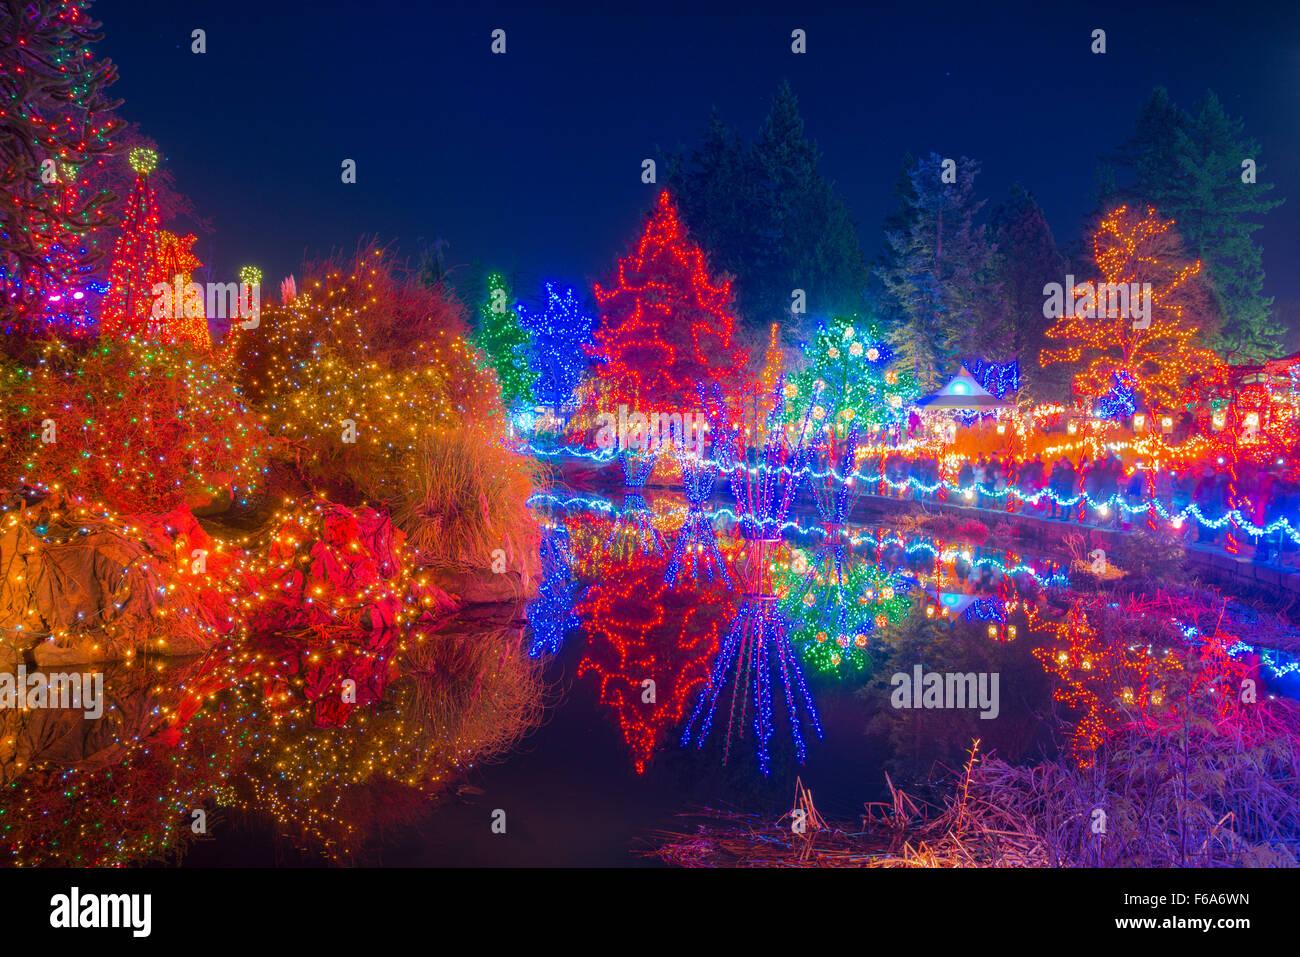 Festival delle Luci, VanDusen Botanical Garden, Vancouver, British Columbia, Canada Immagini Stock